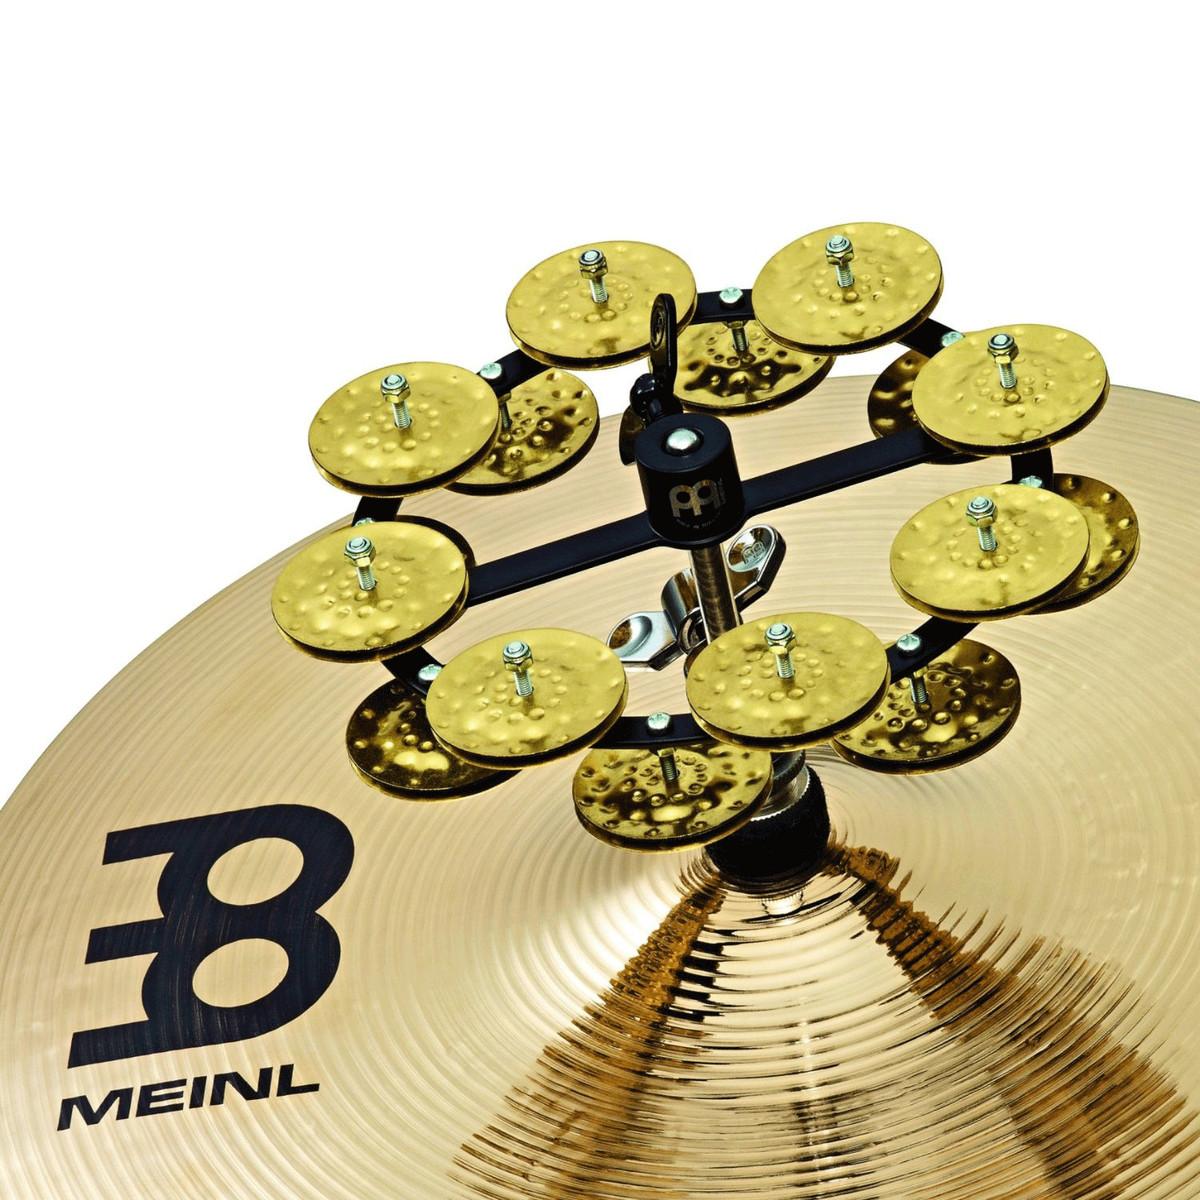 meinl headliner series hi hat tambourine 2 row brass jingles at gear4music. Black Bedroom Furniture Sets. Home Design Ideas